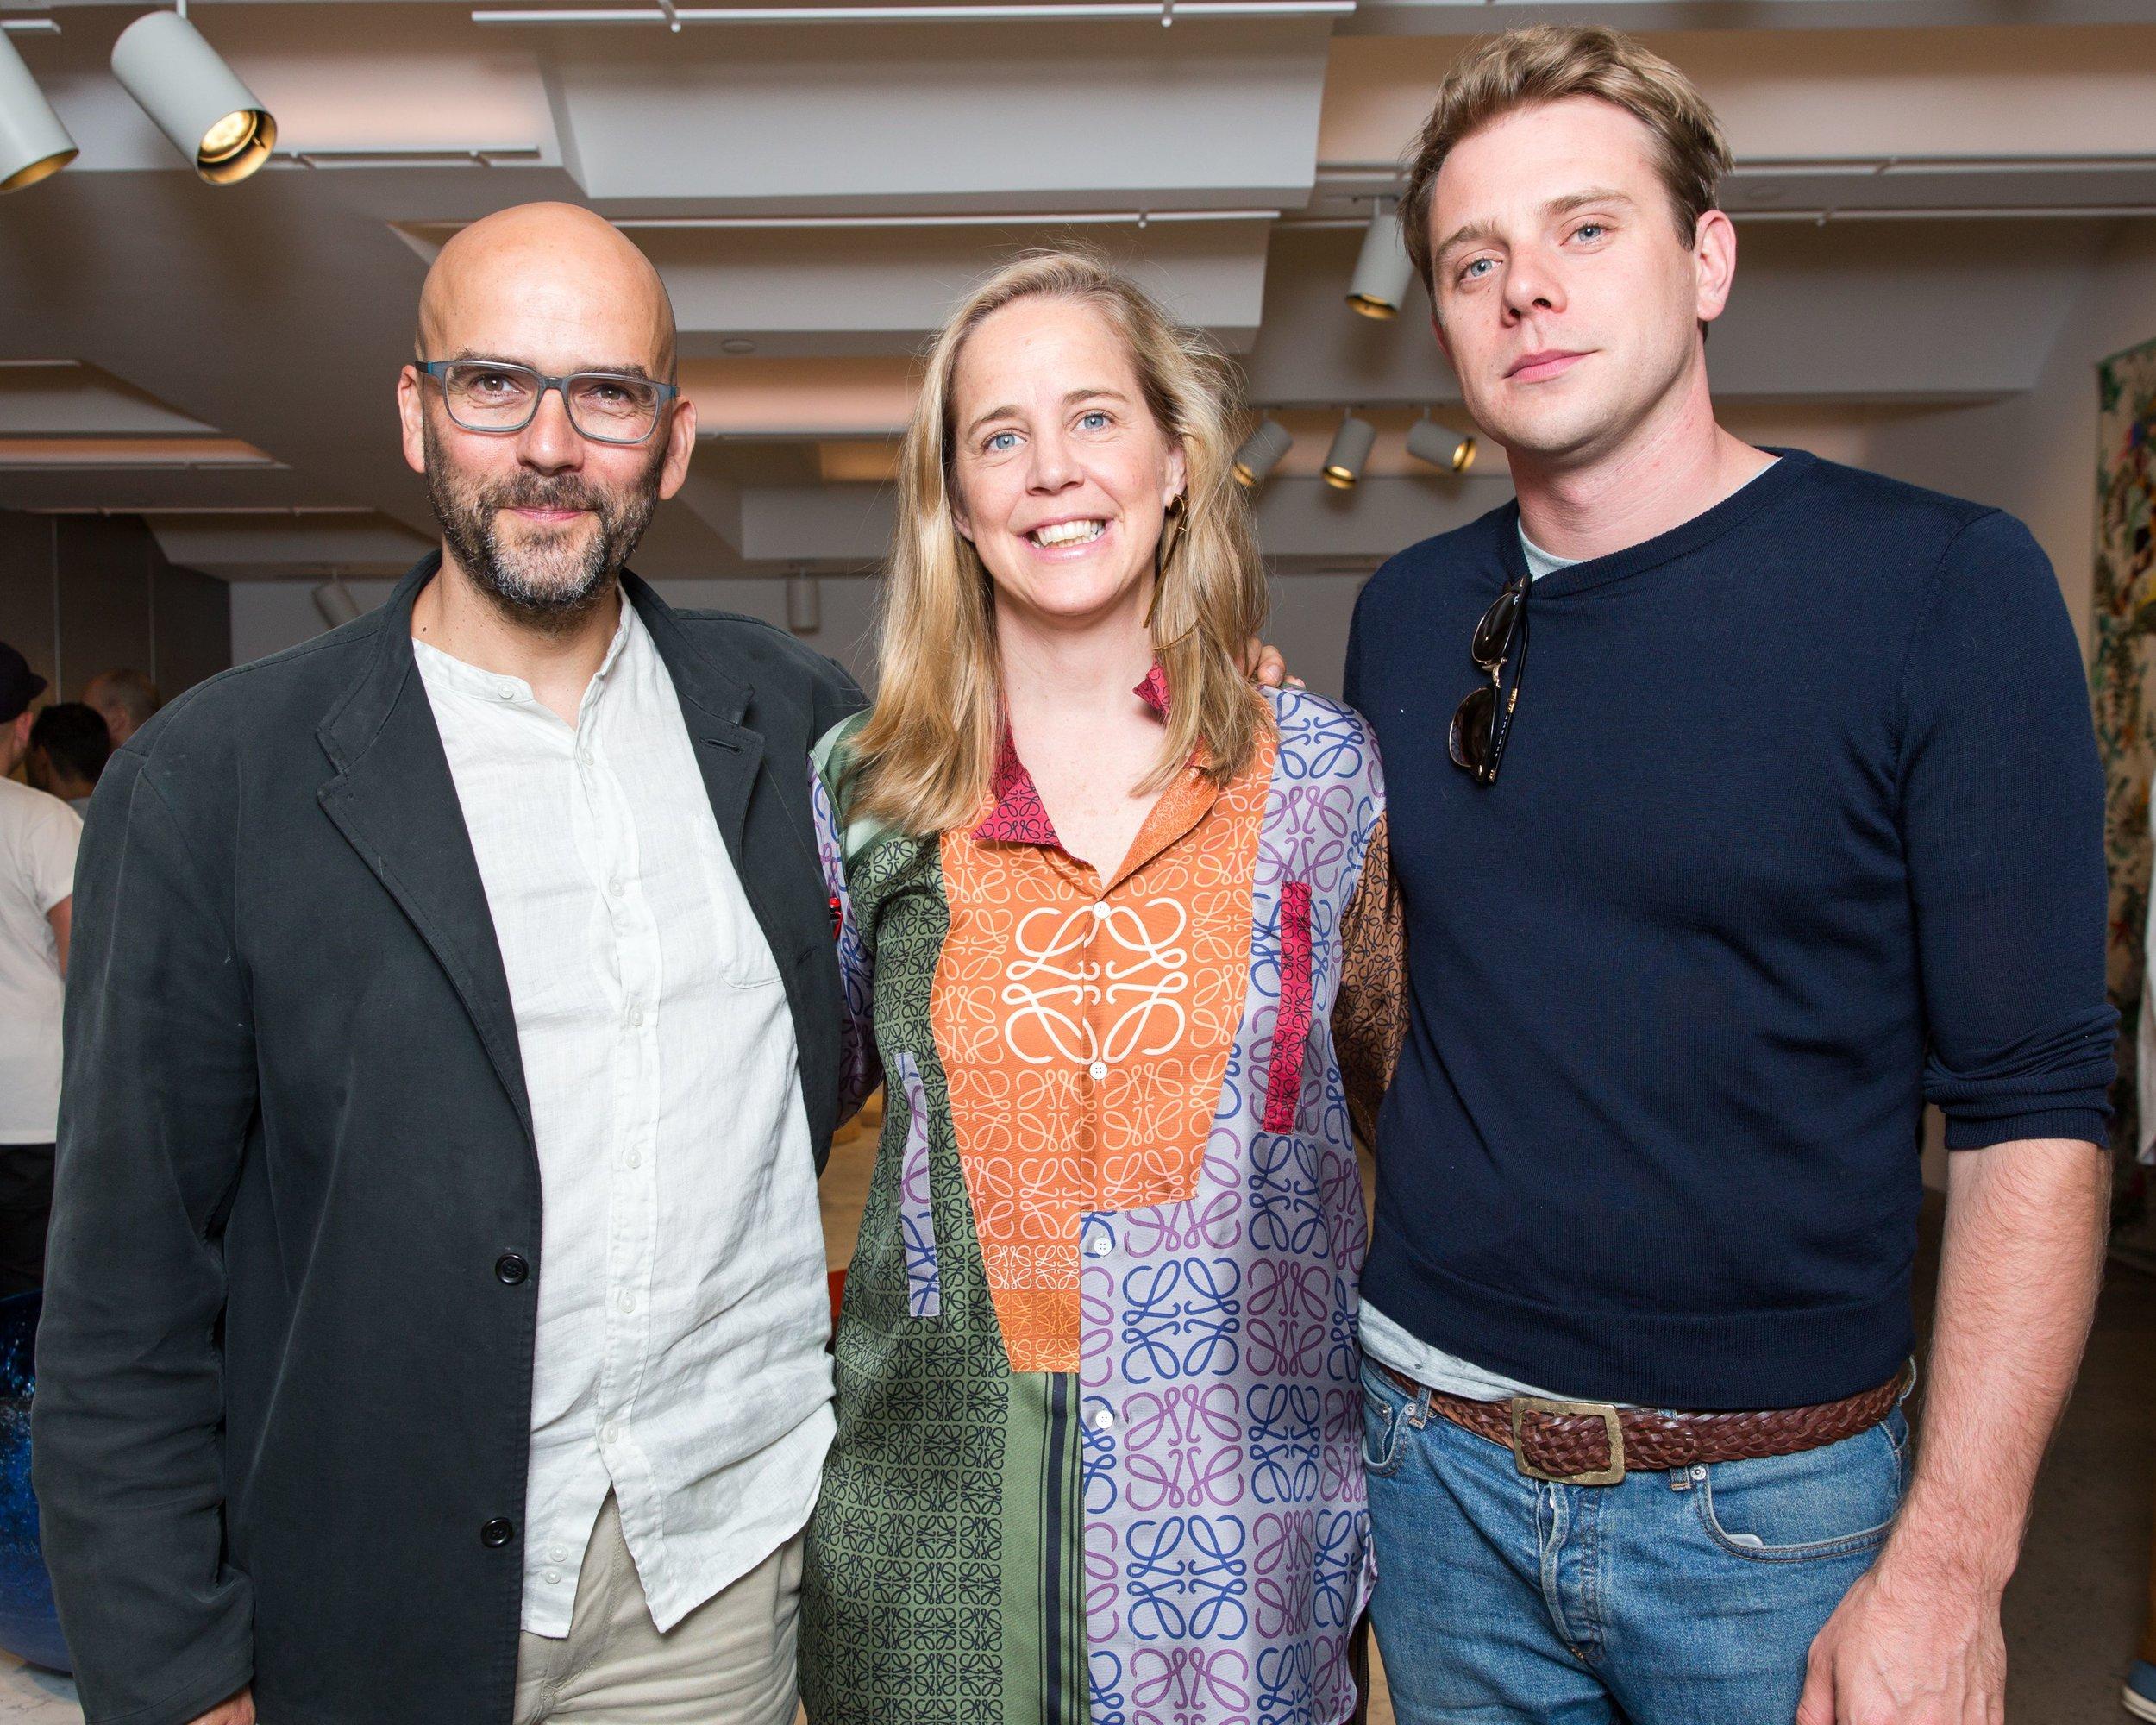 Ernst Gamperl with Sheila Loewe and Loewe Creative Director Jonathan Anderson / Photo: Benjamin Lozovsky/BFA.com